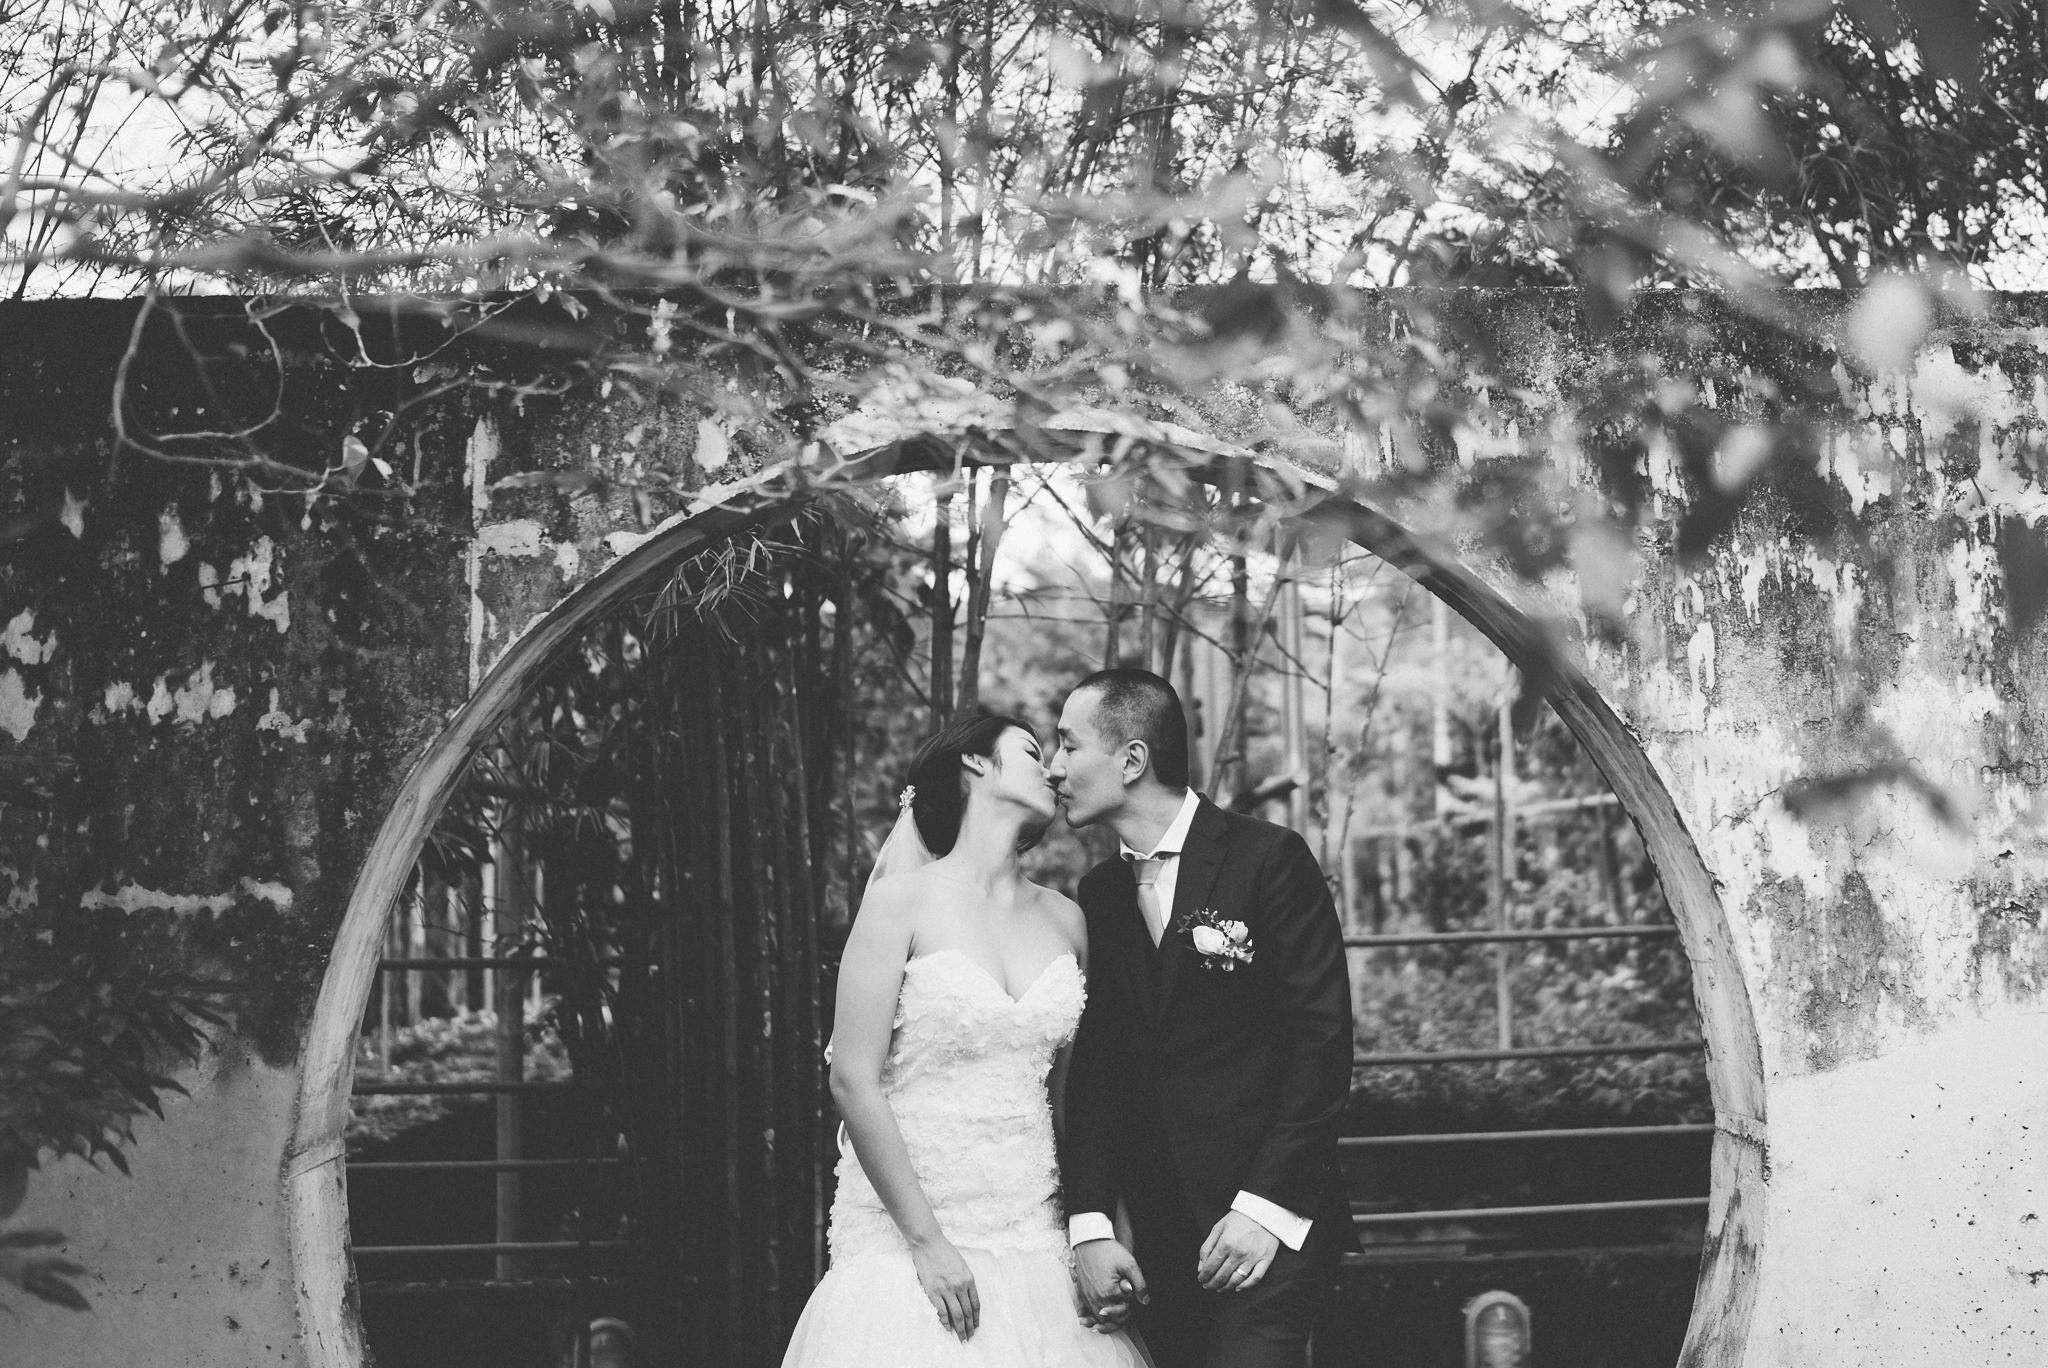 Singapore Wedding Photographer Garden asia shamrock chapel actual day wedding coverage (109 of 110).JPG